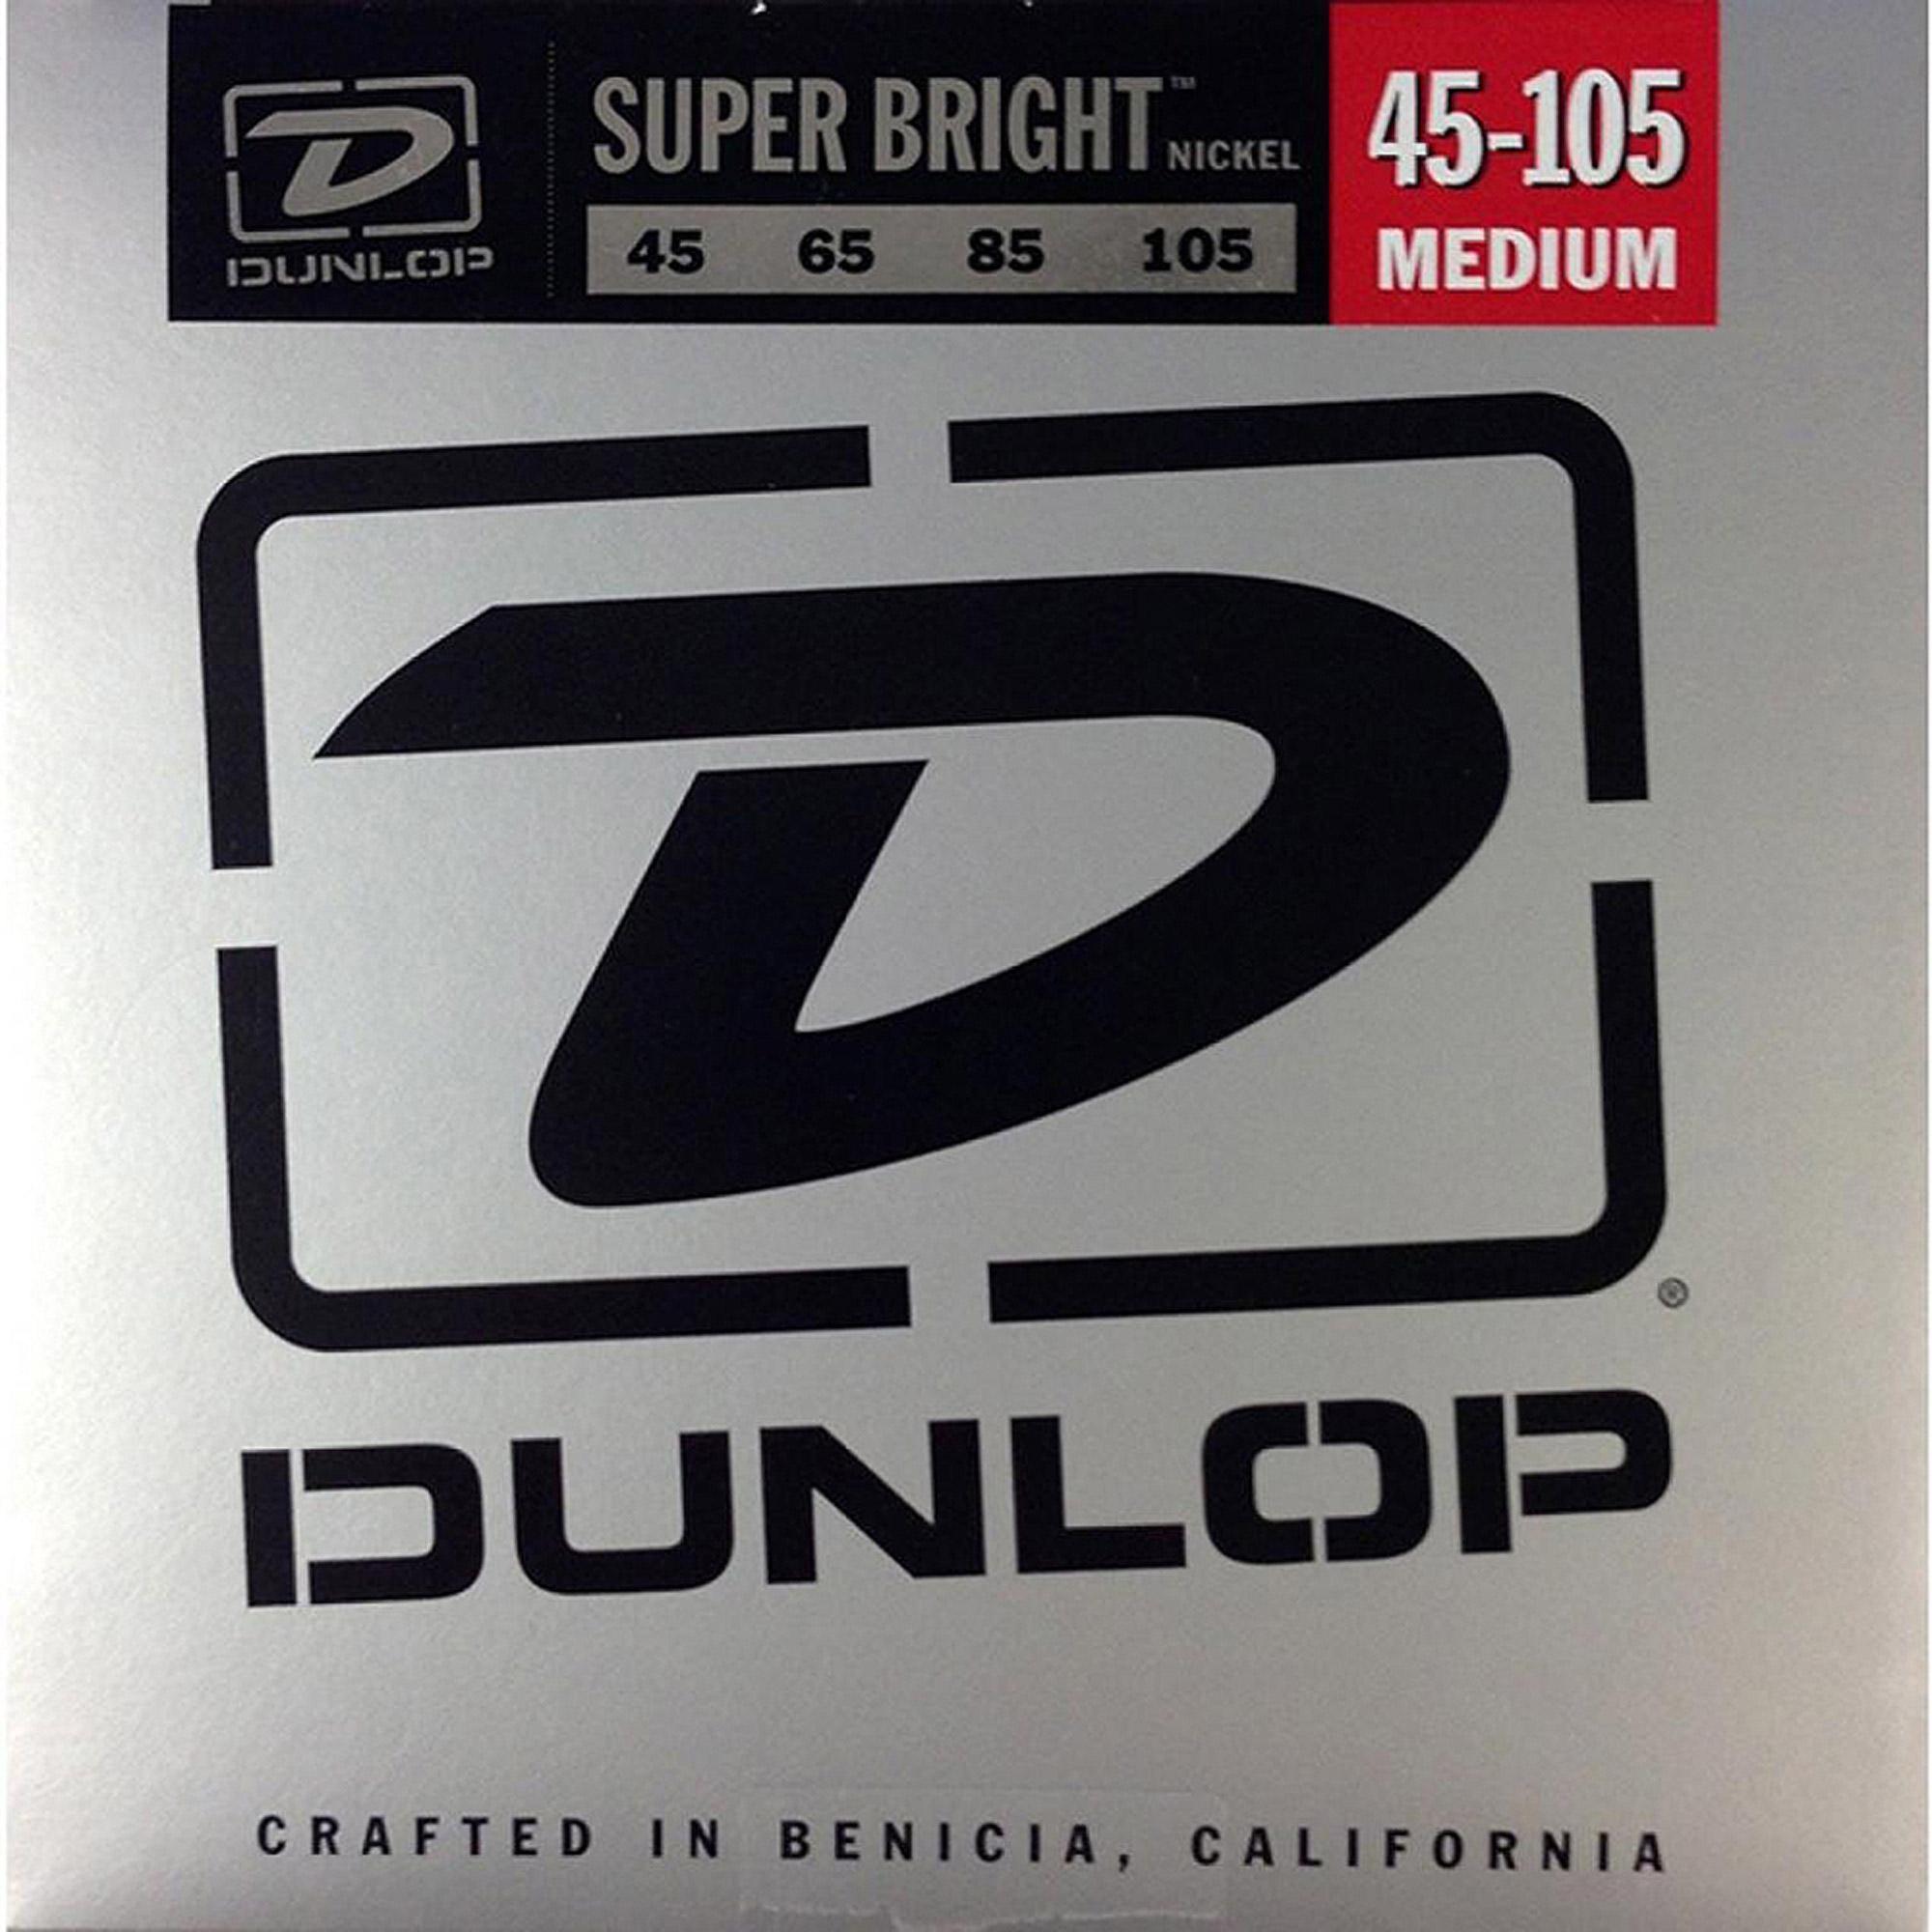 Dunlop DBSBN45105 Super Bright Nickel-Plated Steel Bass 4 String Set, .45-.105